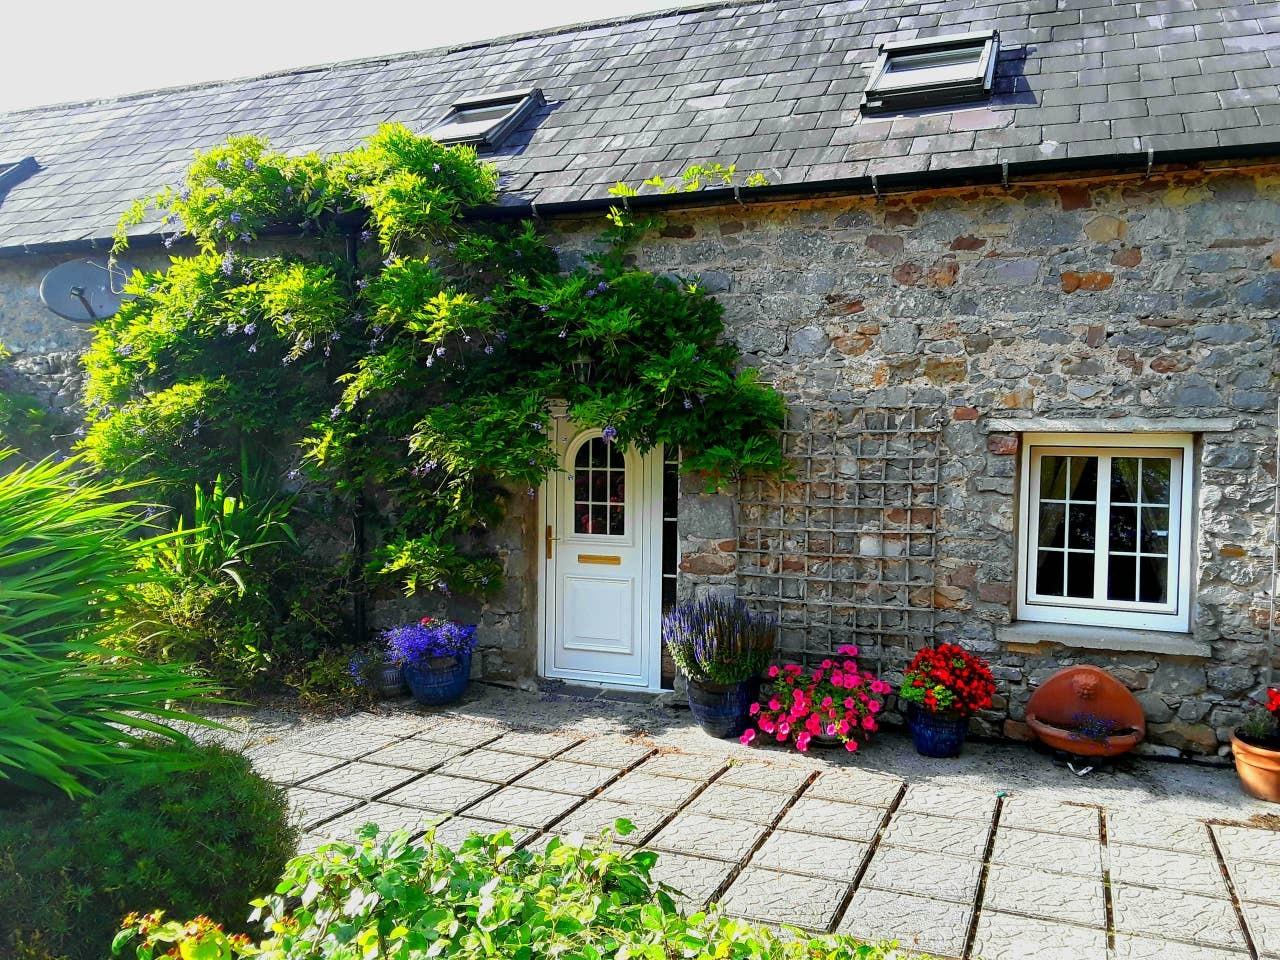 Rossagh West, Doneraile, Co. Cork